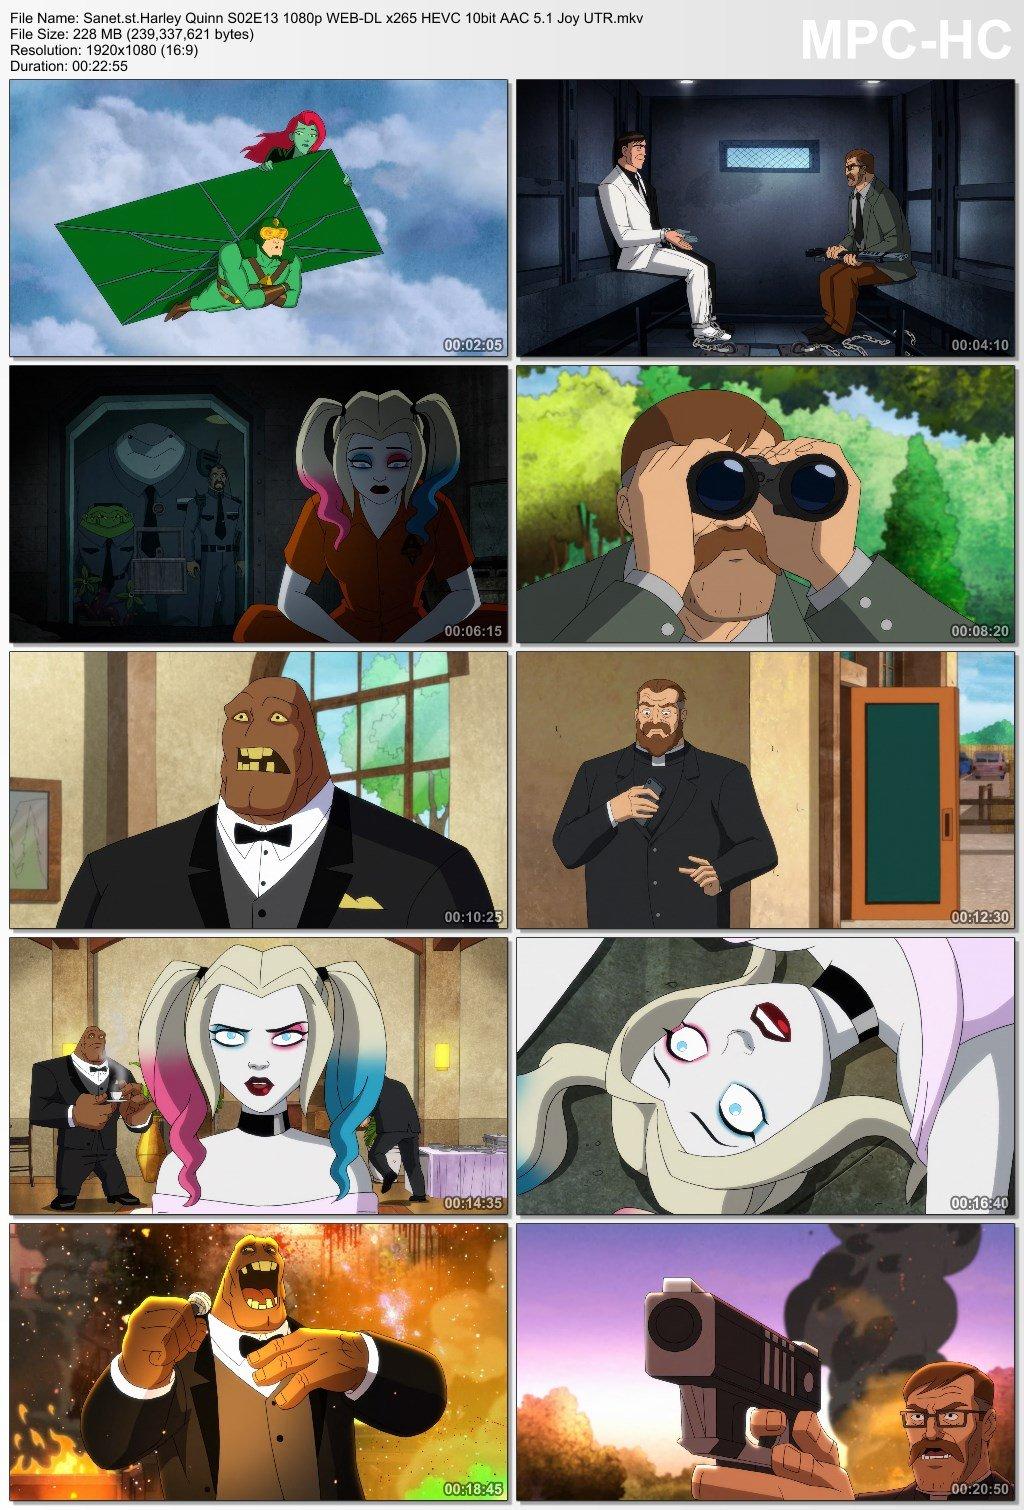 Download Harley Quinn S02E04 (1080p WEB-DL x265 HEVC 10bit